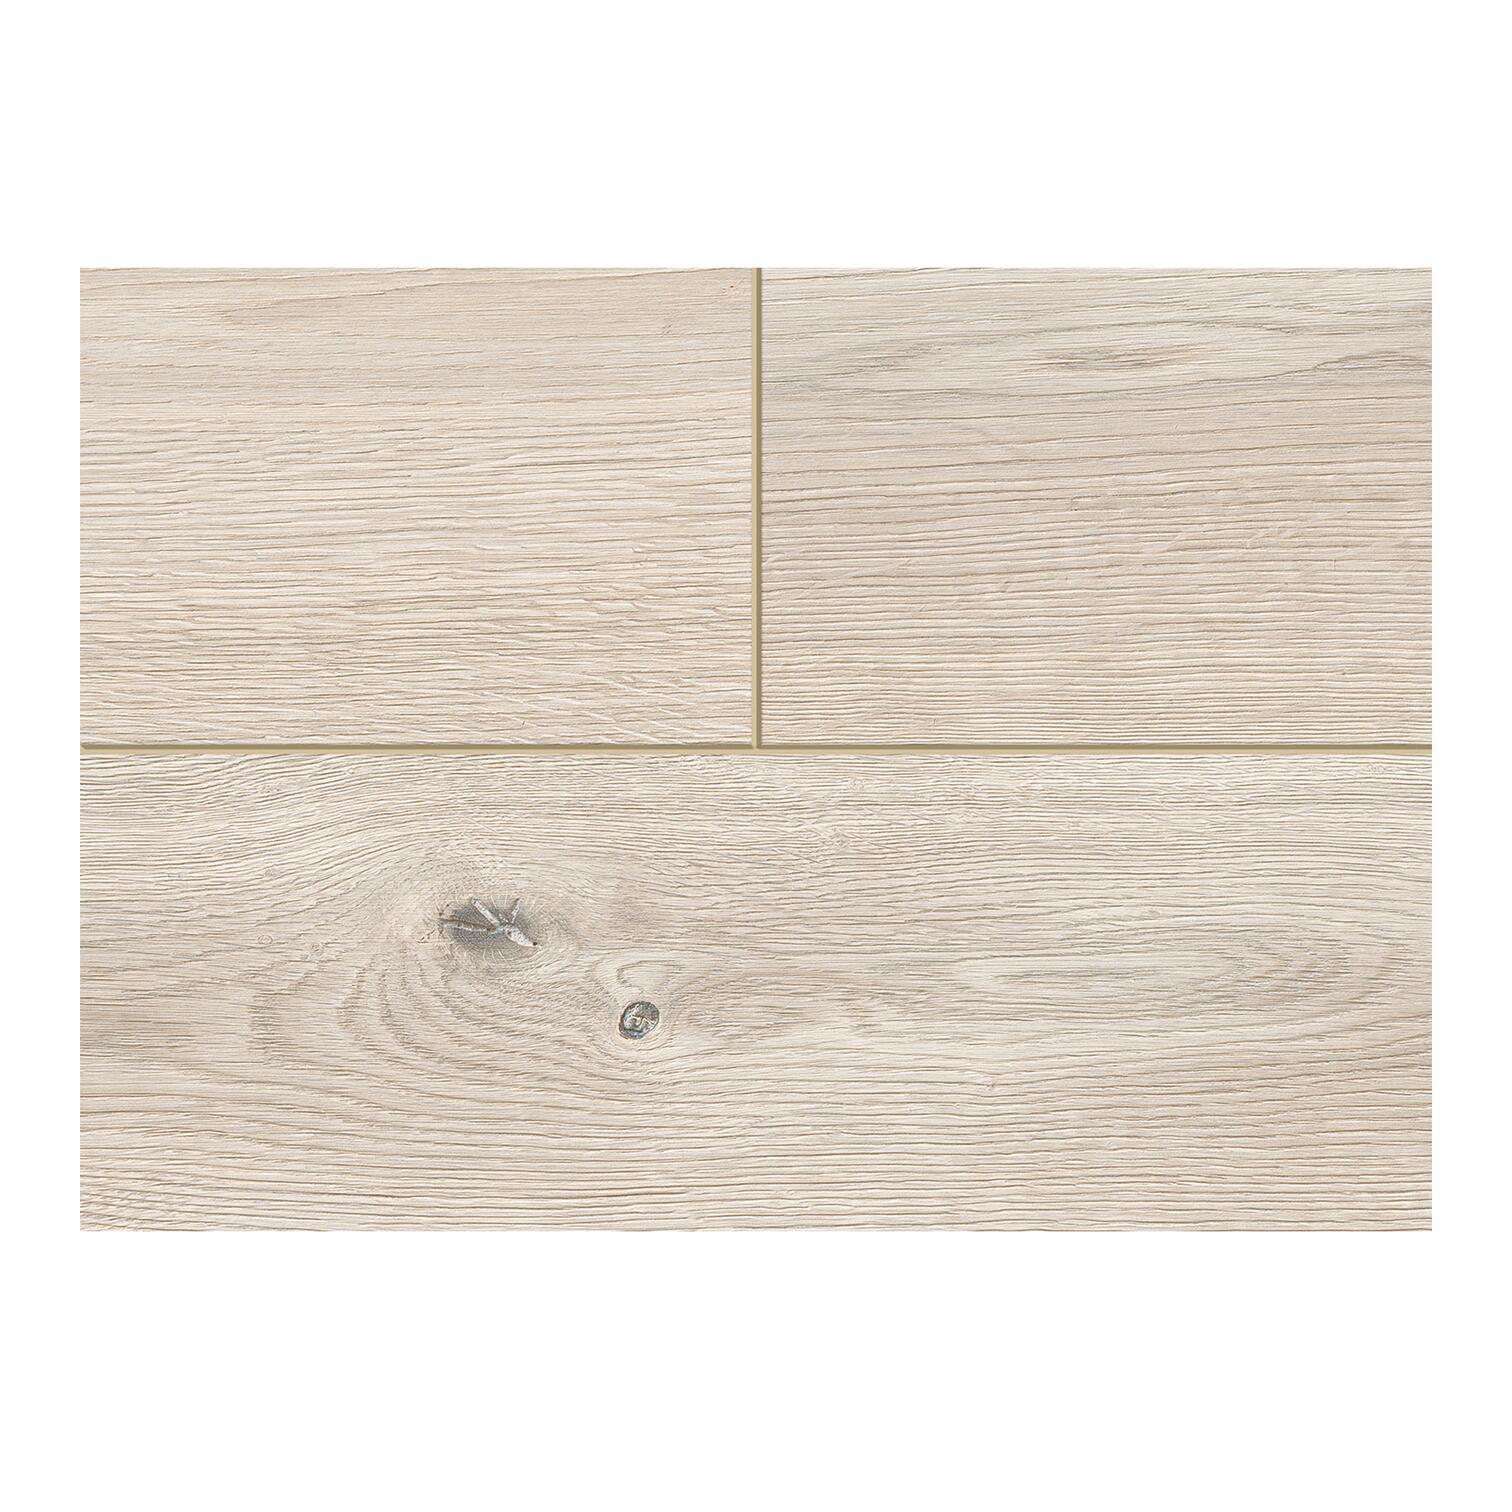 Pavimento SPC flottante clic+ Seaside Sp 4.6 mm beige - 3